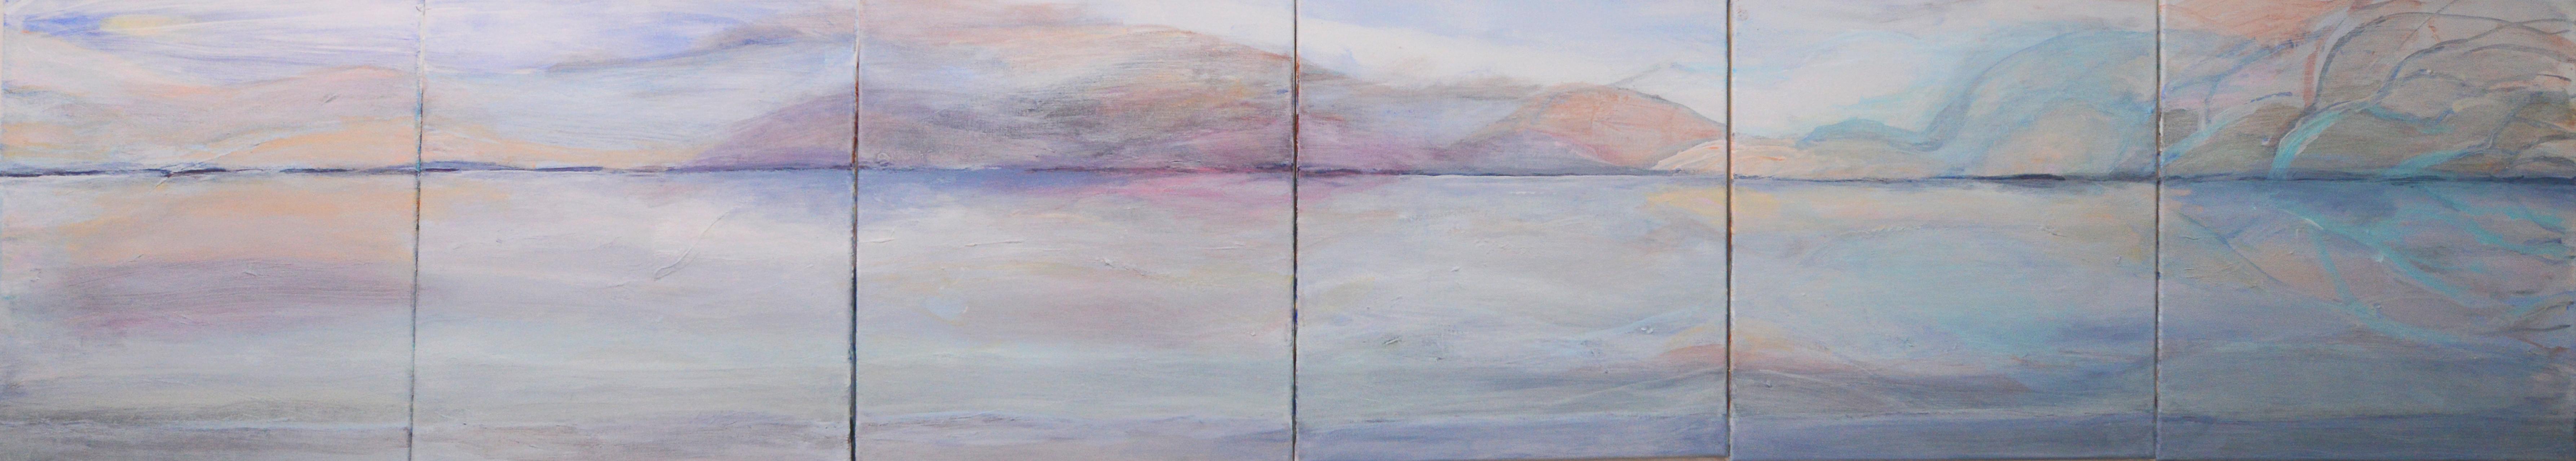 Kuviteltu maisema 2018 (6x40cmx40cm)